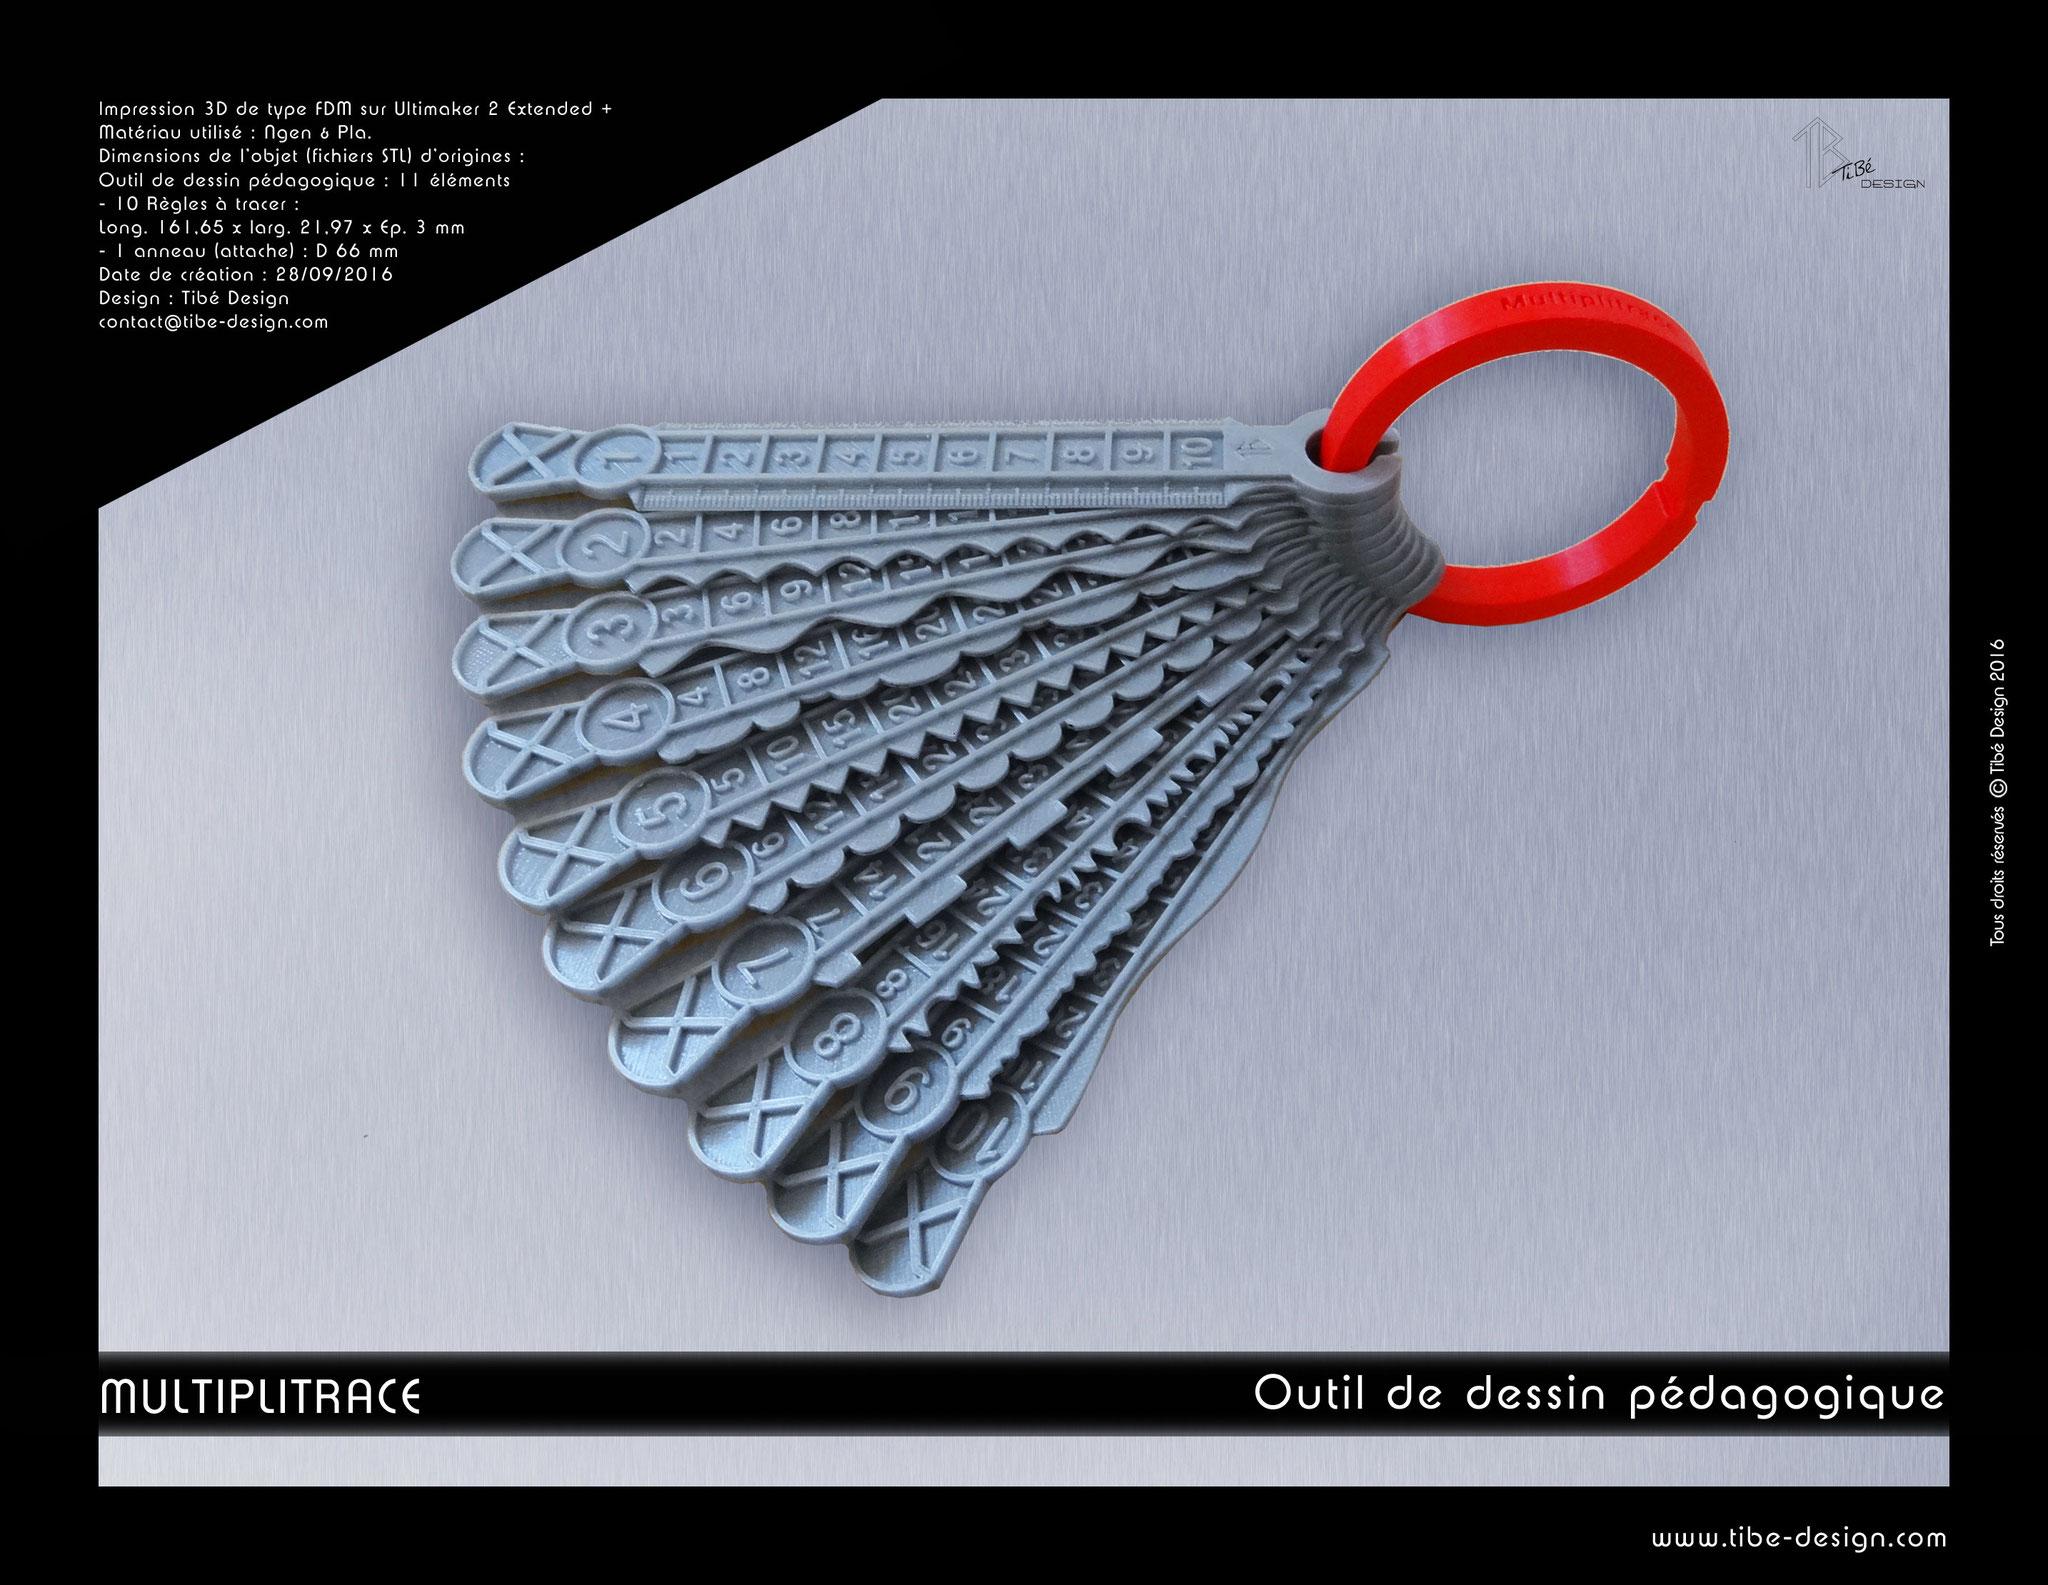 Outil de dessin Multiplitrace